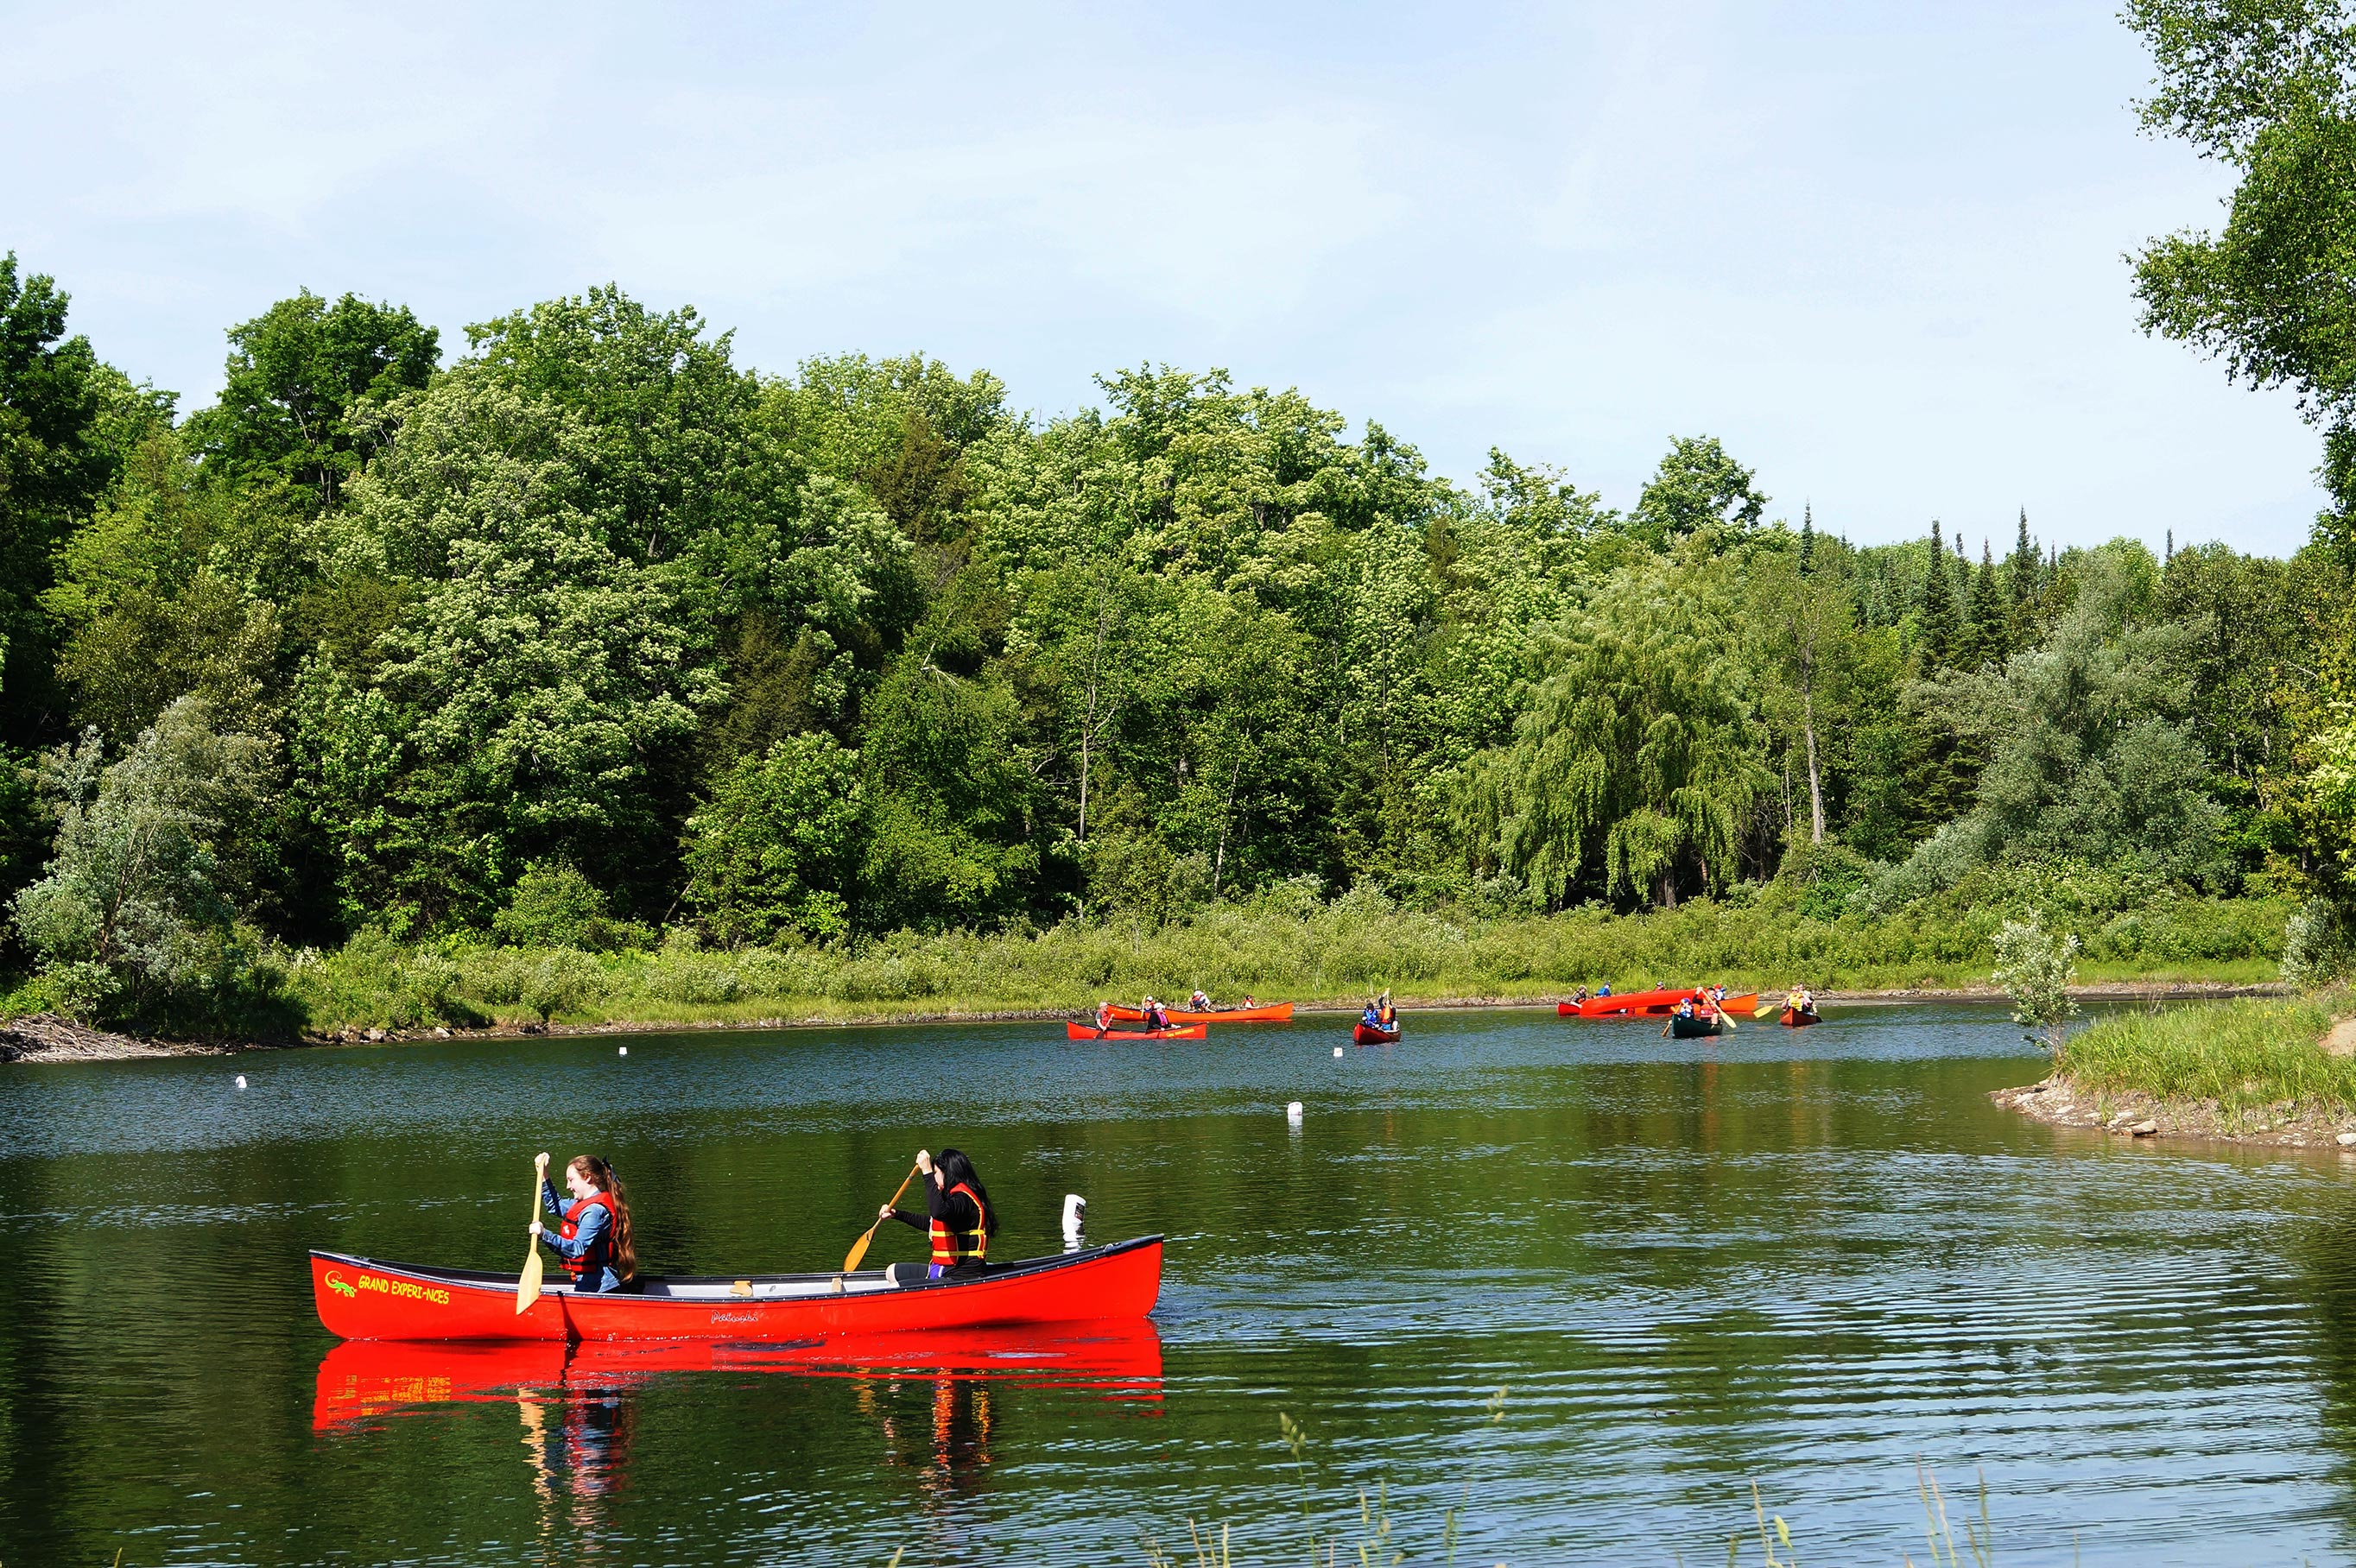 2 people canoeing